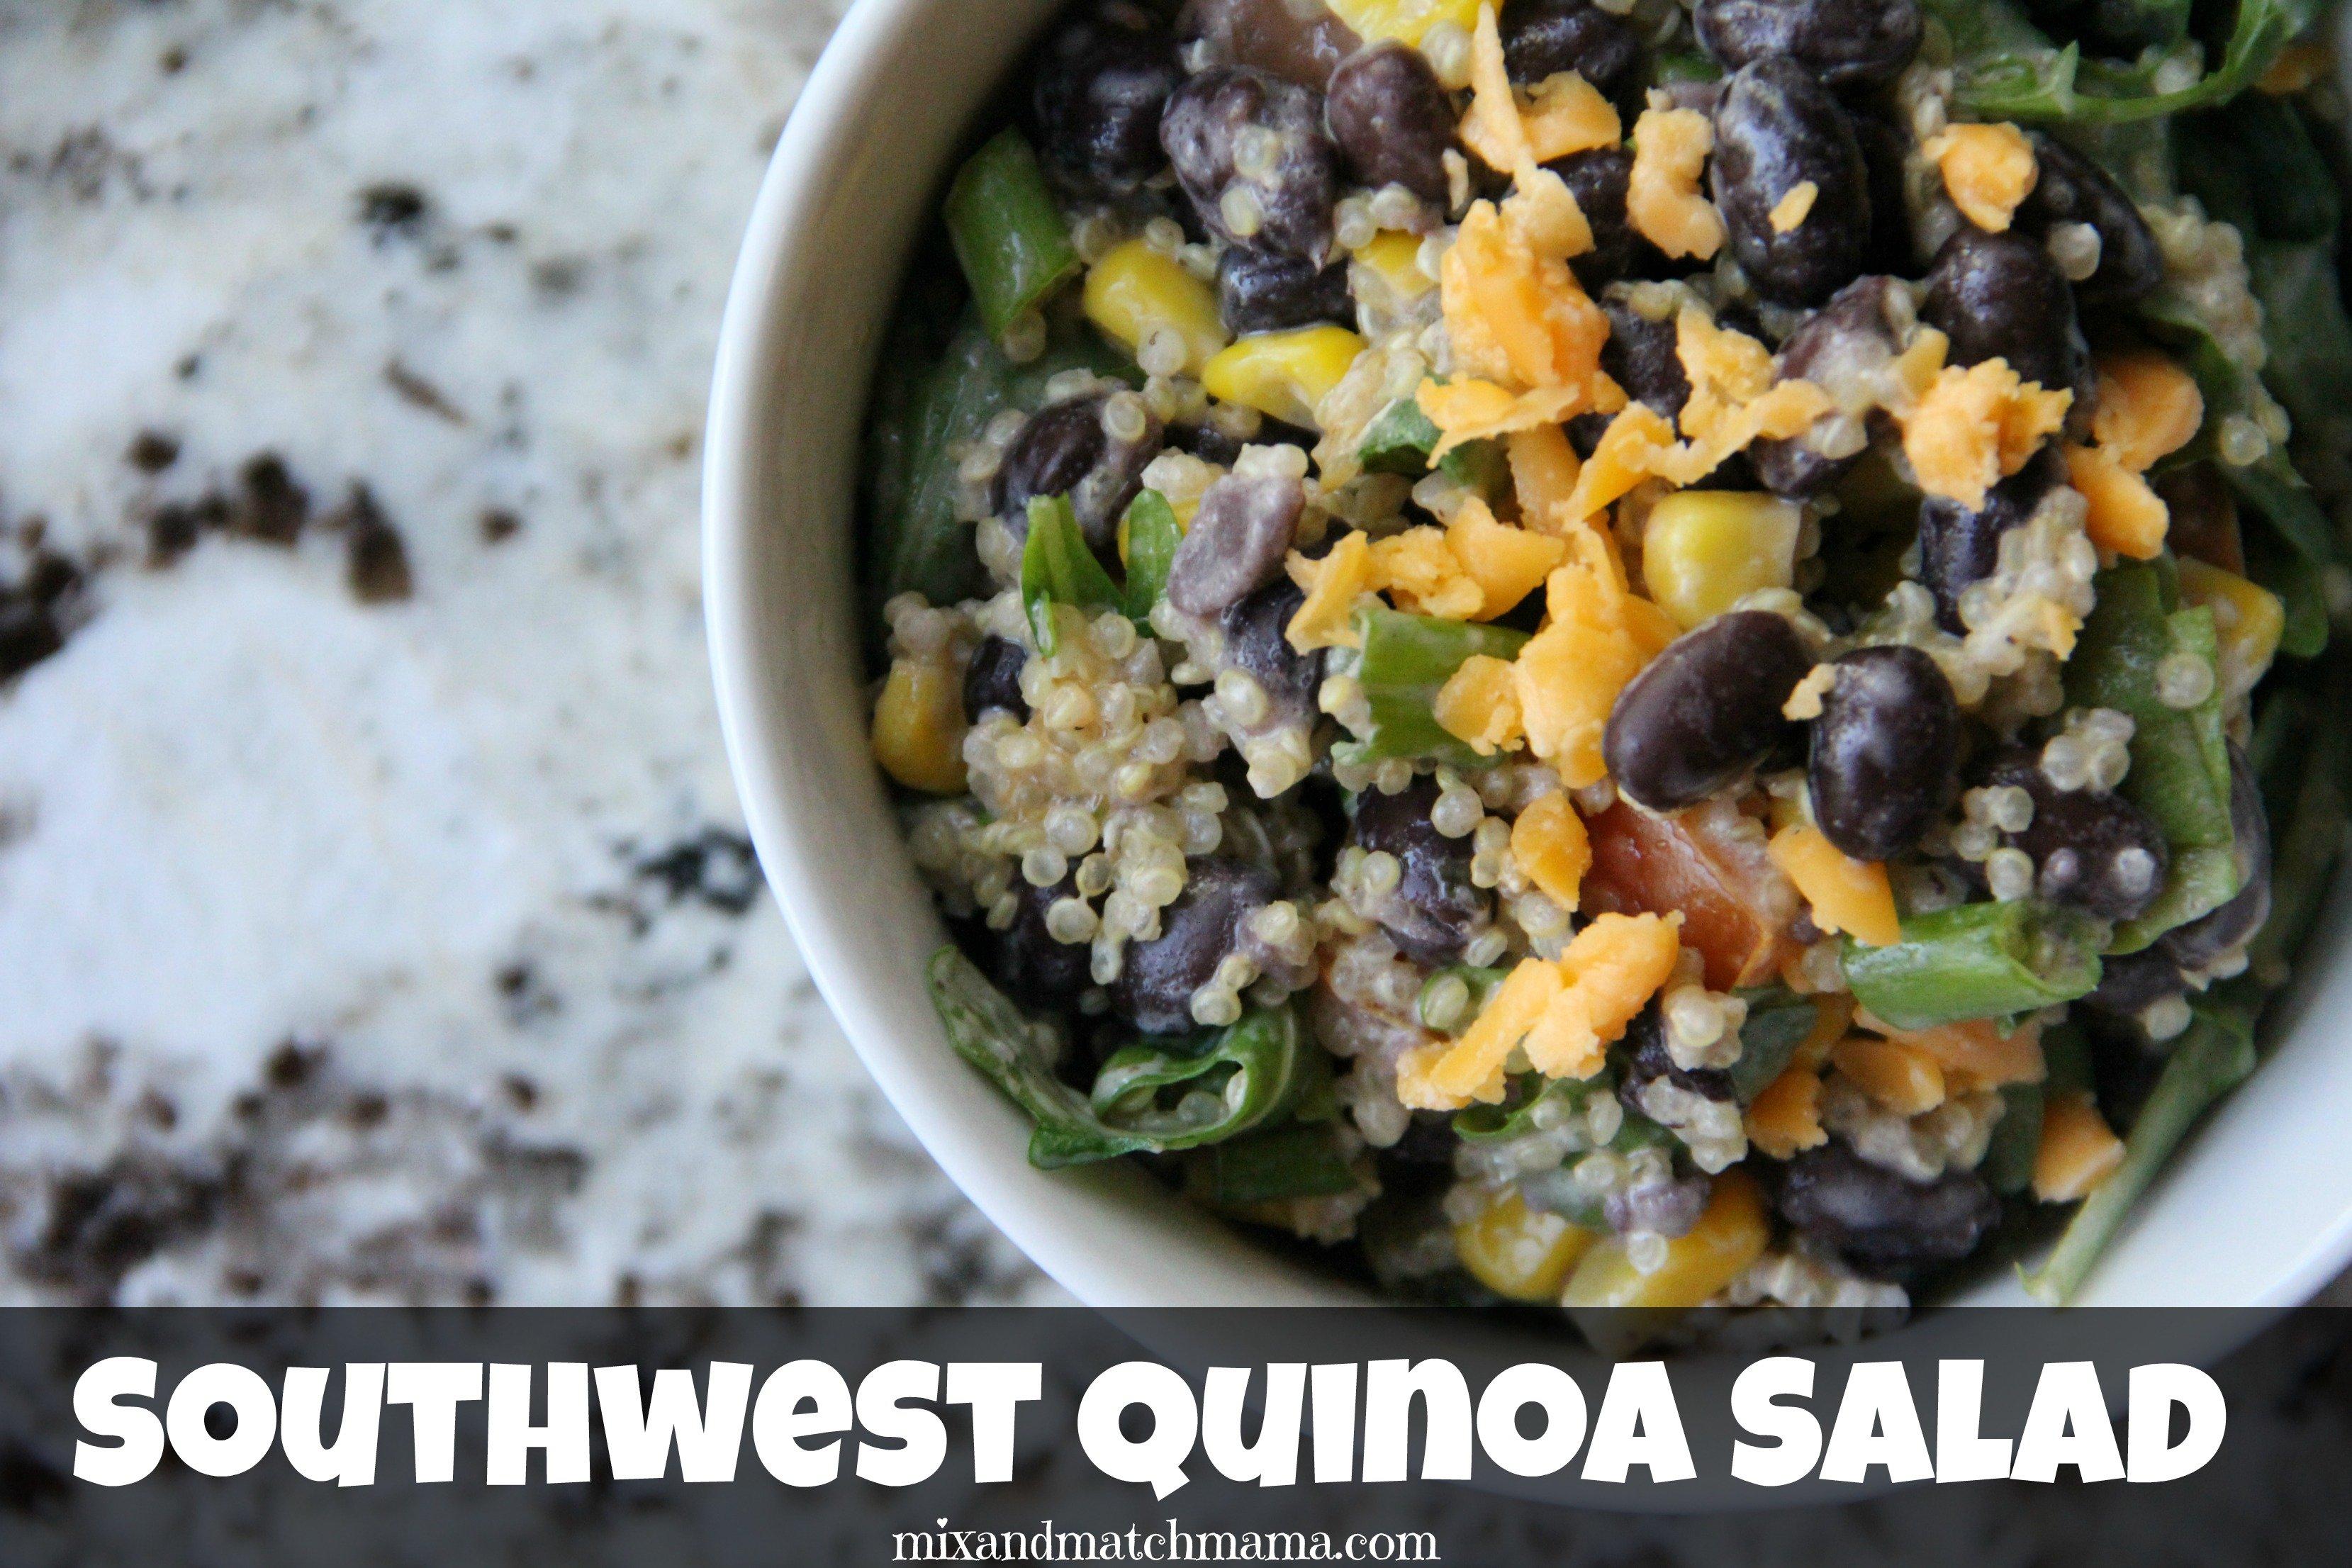 Southwest Quinoa Salad | Mix and Match Mama